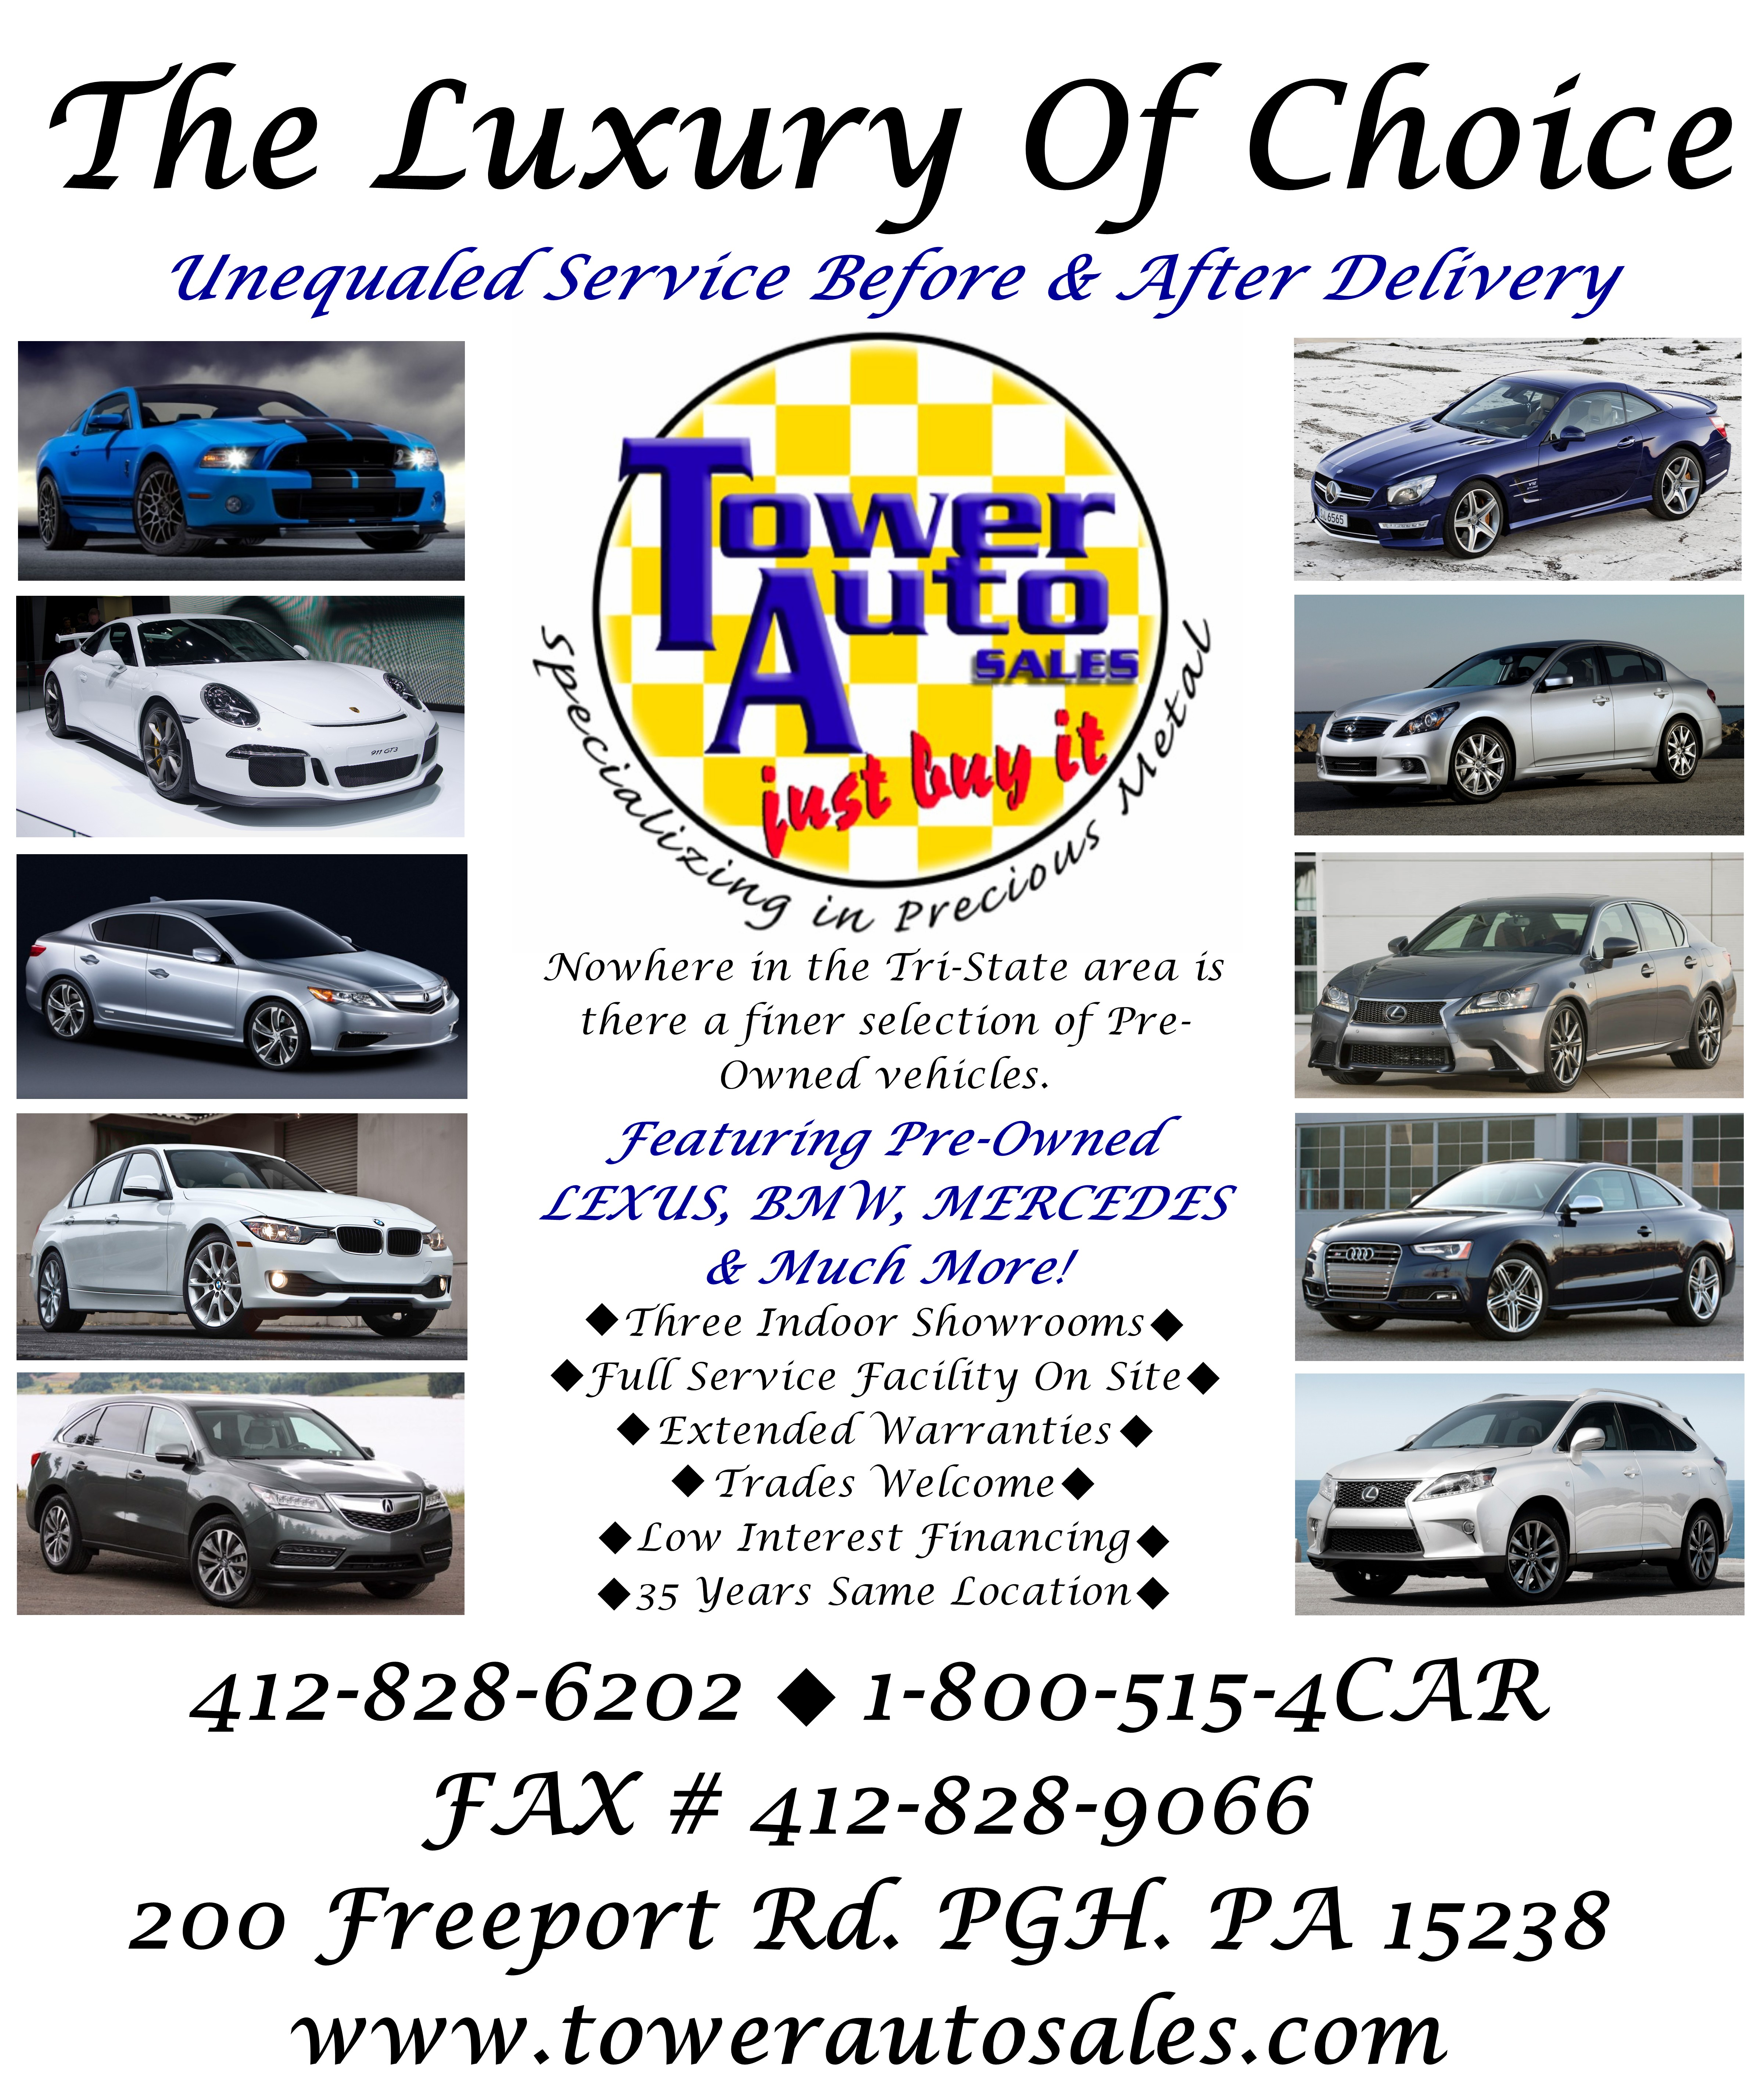 Tower Auto Sales >> Tower Auto Sales Inc In Blawnox